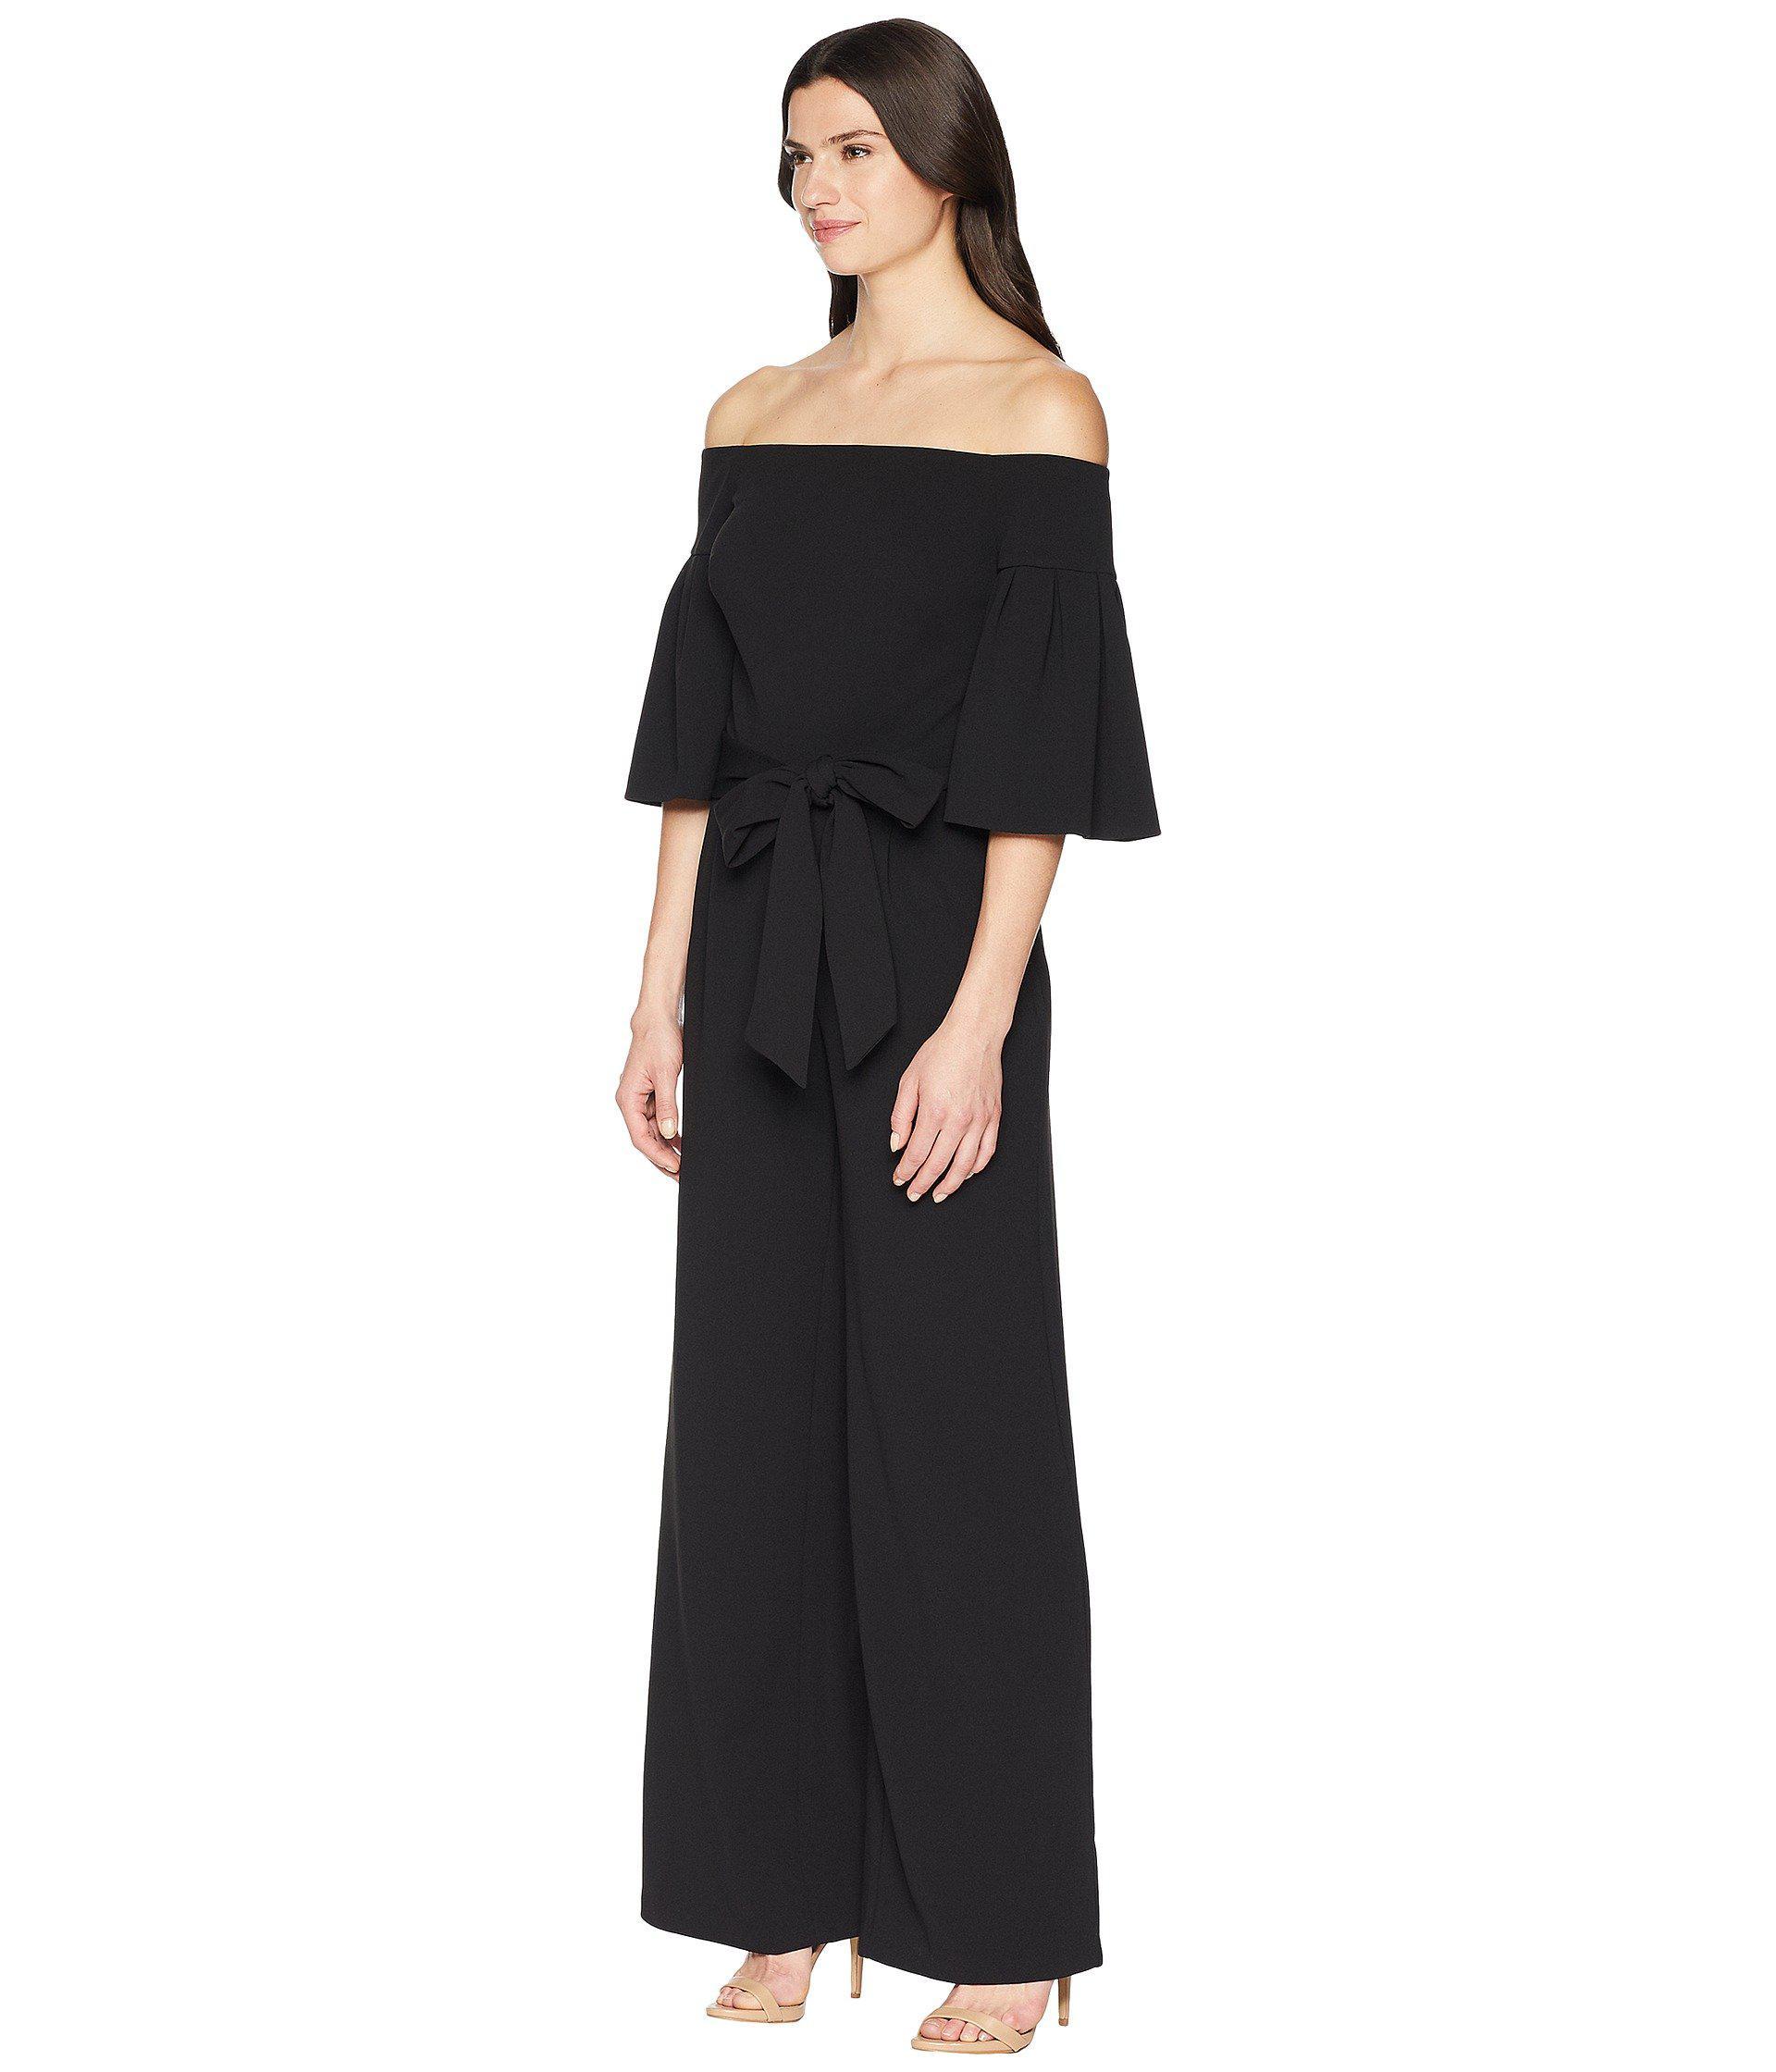 68362b501cc1 Lyst - Lauren by Ralph Lauren 130h Luxe Tech Crepe Ranada Jumpsuit in Black  - Save 65%